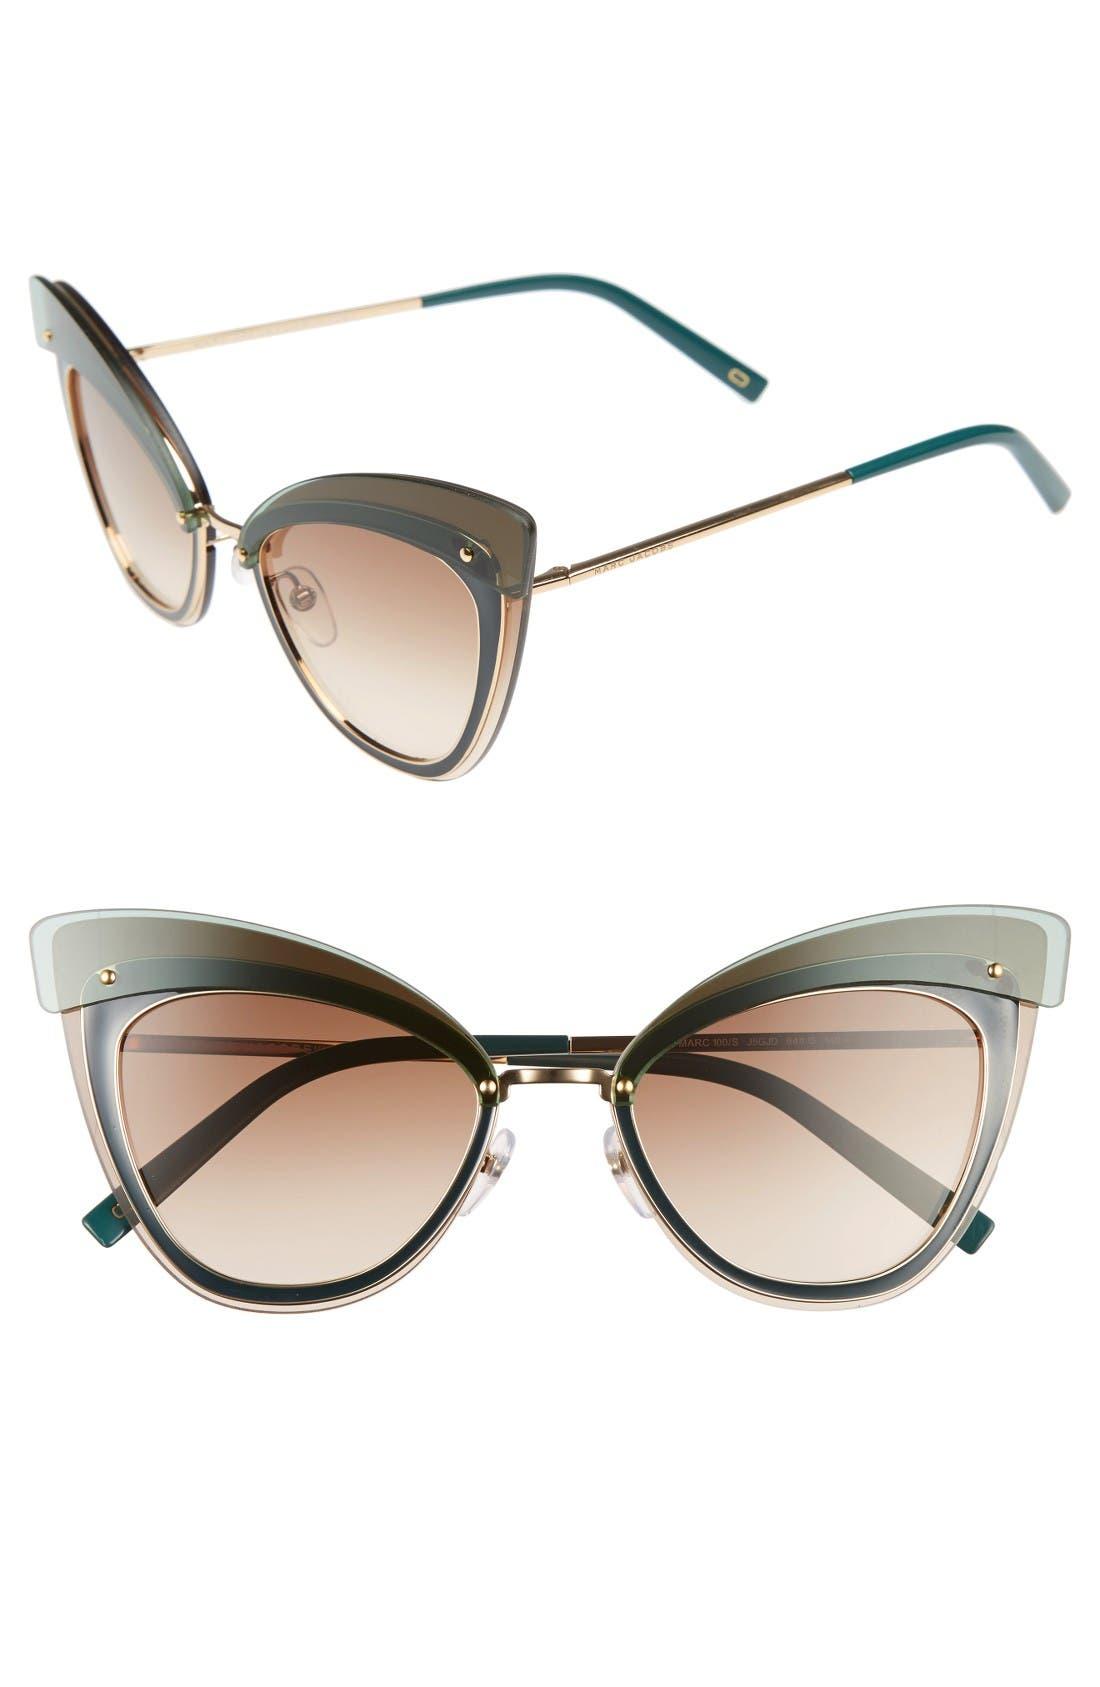 Main Image - MARC JACOBS 64mm Sunglasses